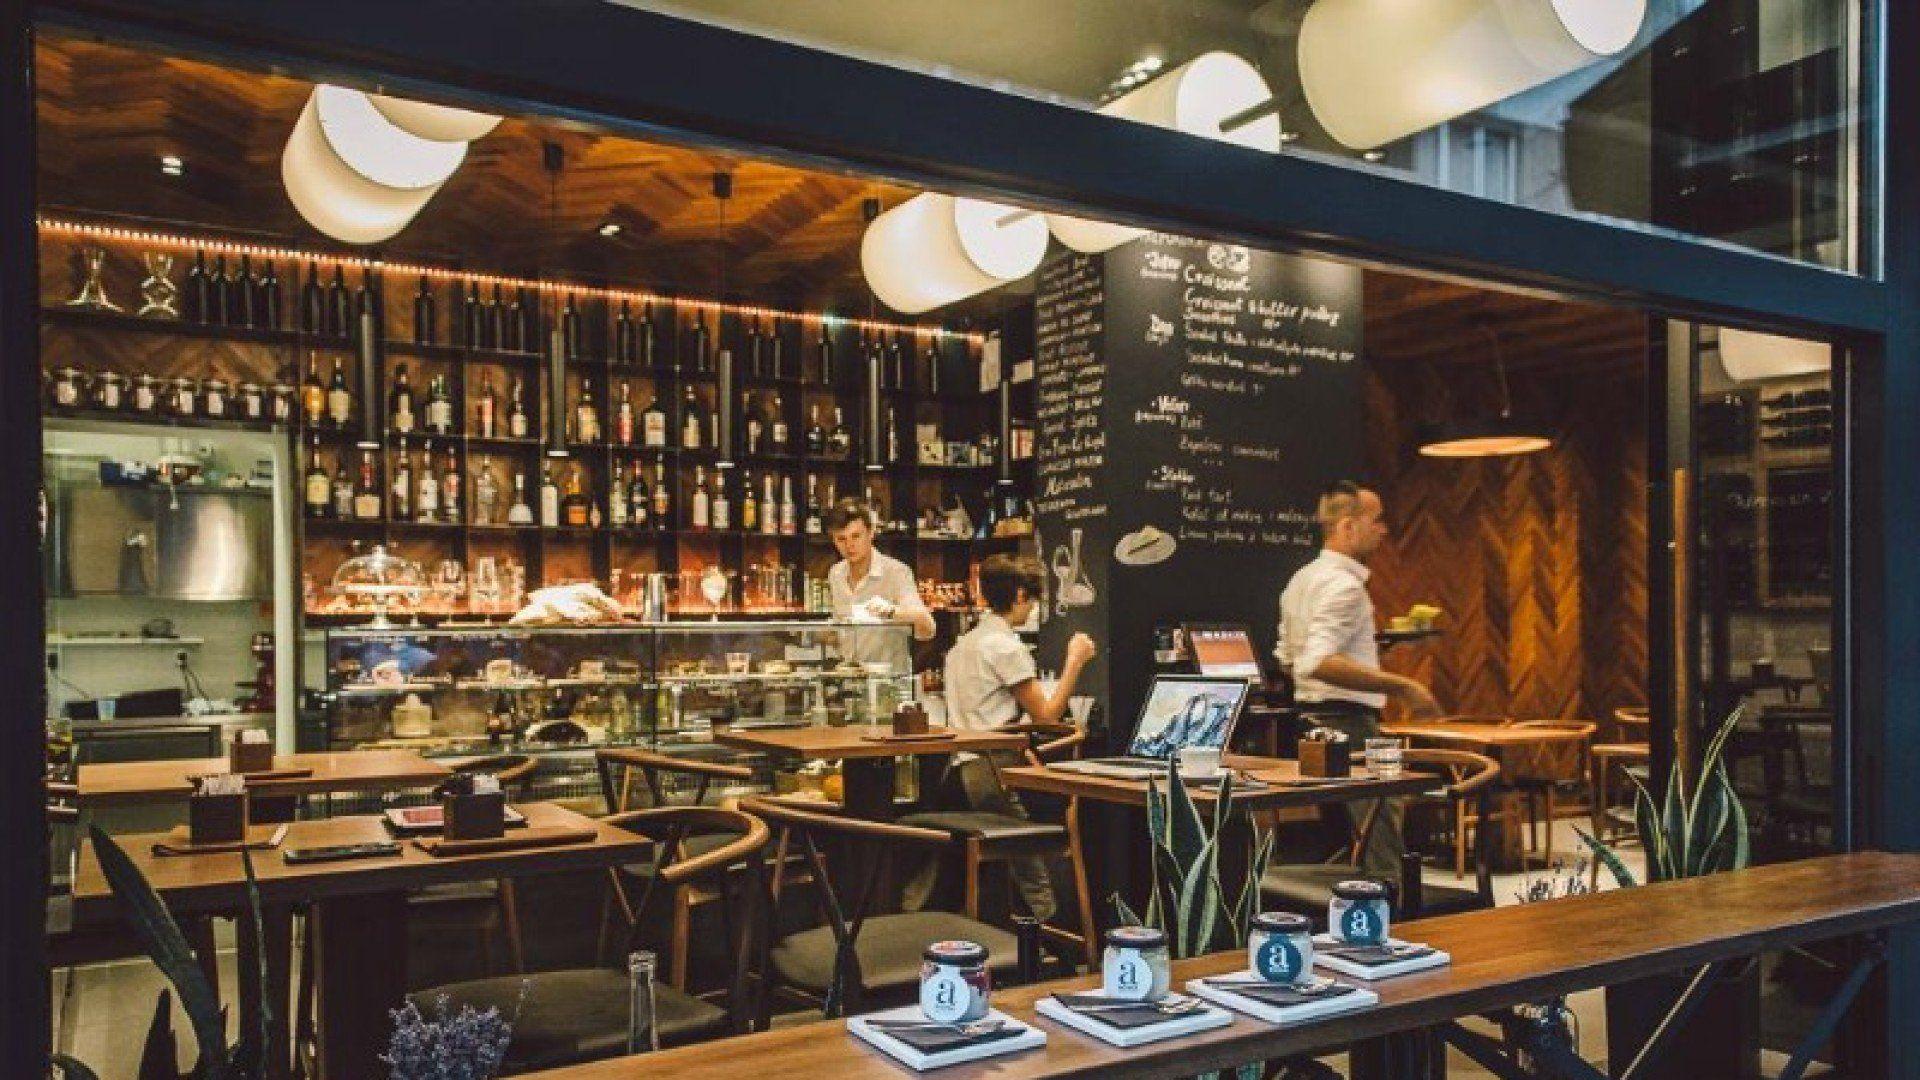 Caffe bar de man croatia zagreb casablanca restaurant for Food bar zagreb